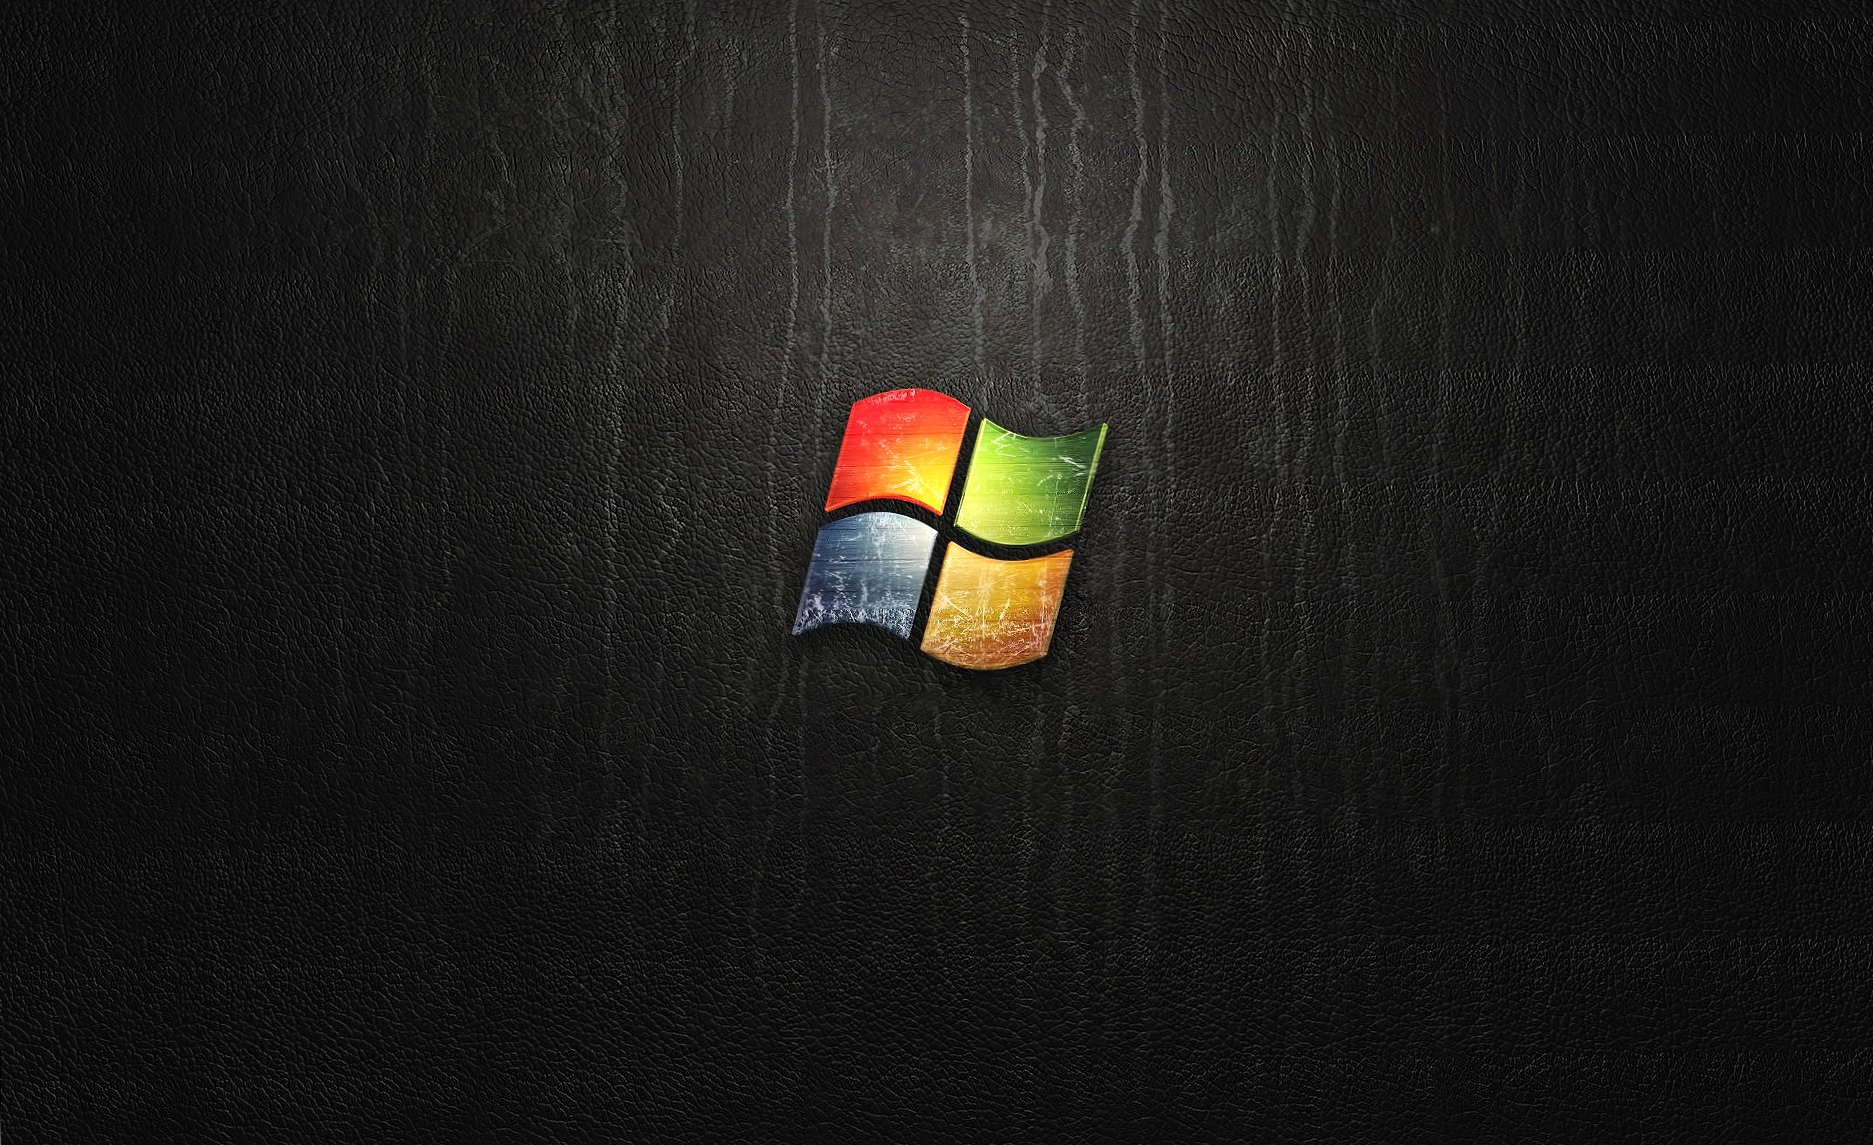 Black skin windows wallpapers HD quality